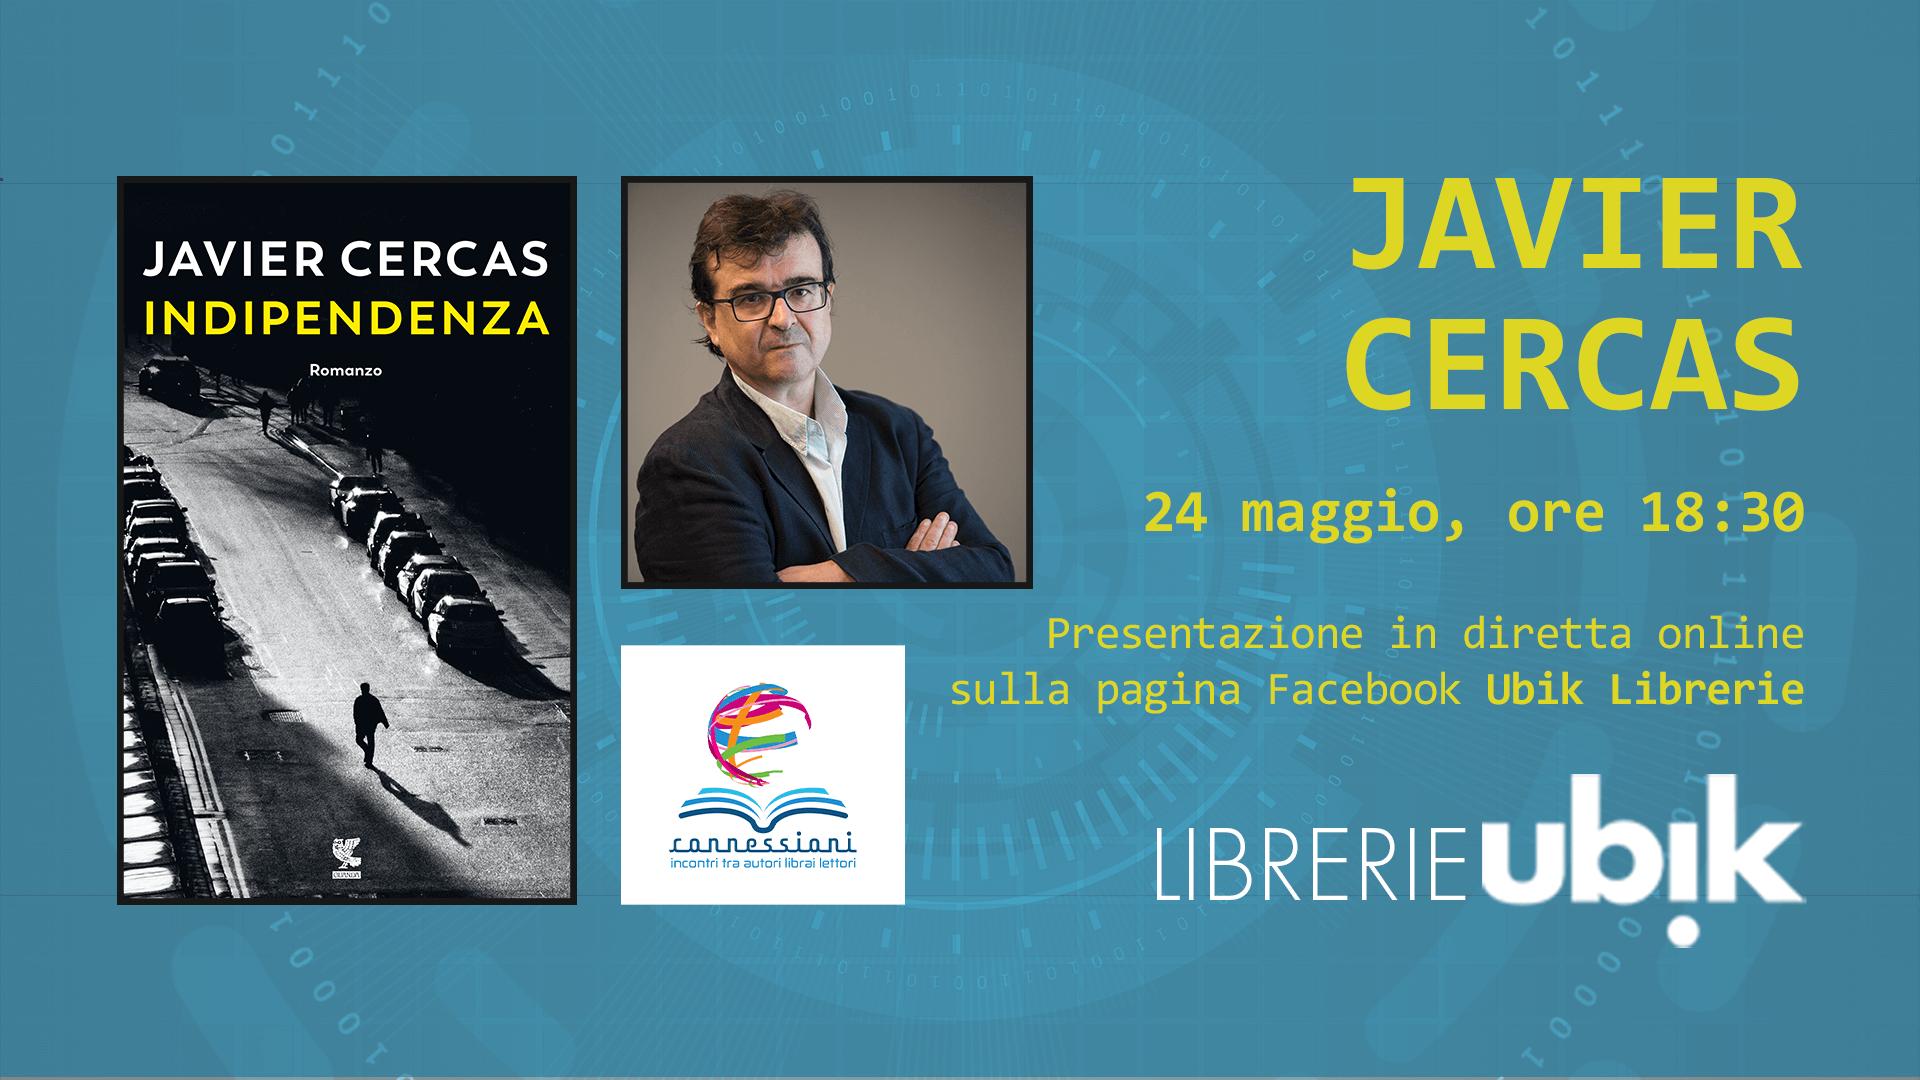 JAVIER CERCAS presenta in diretta online